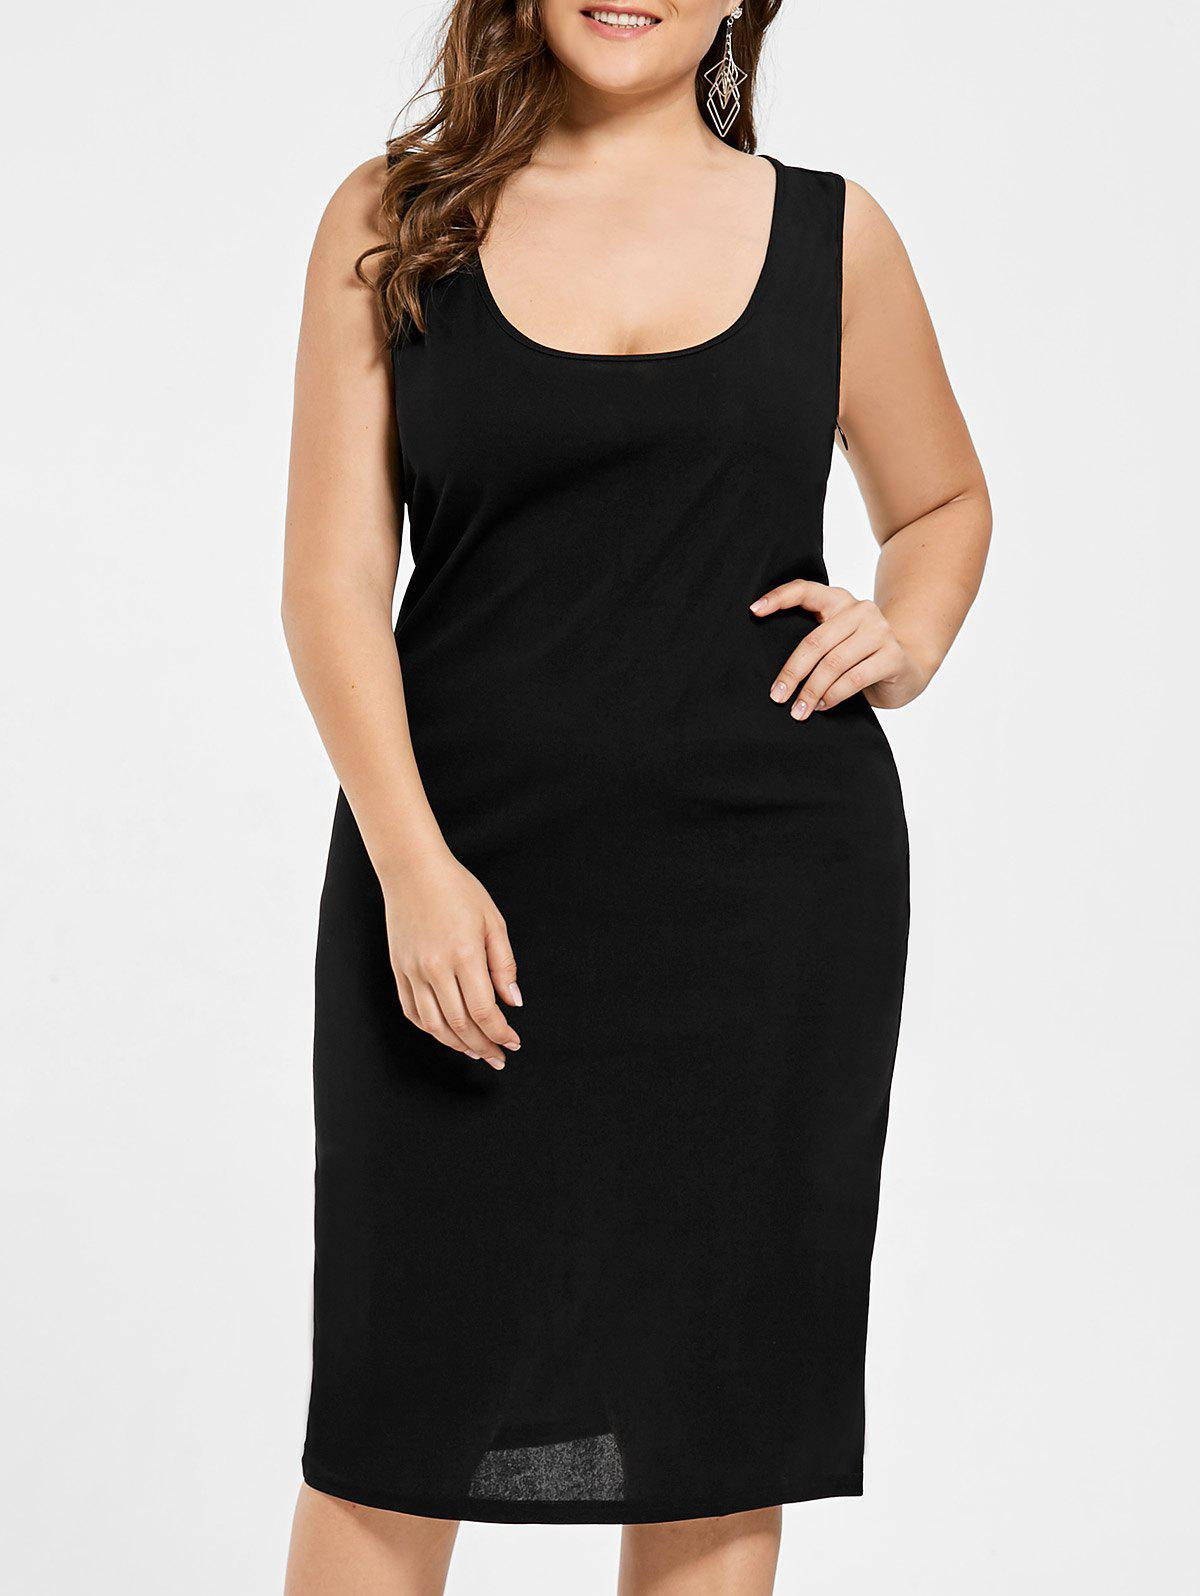 U Neck Plus Size Tank Dress